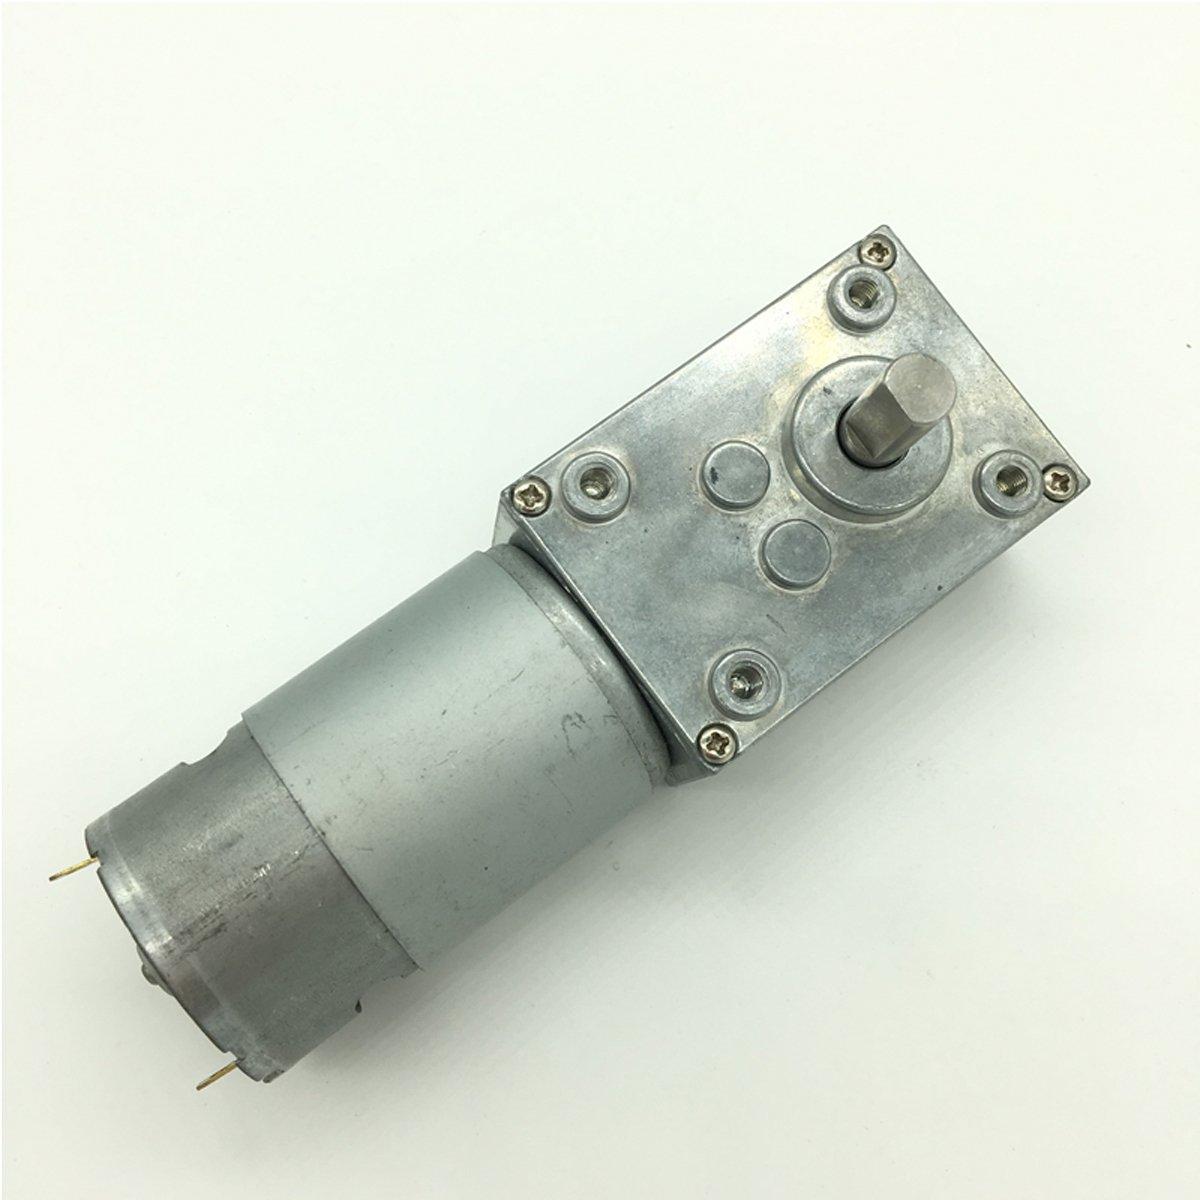 Bringsmart DC Worm Gear 24V High Torque Self-lock Motor (A58SW-555 24V 16rpm)